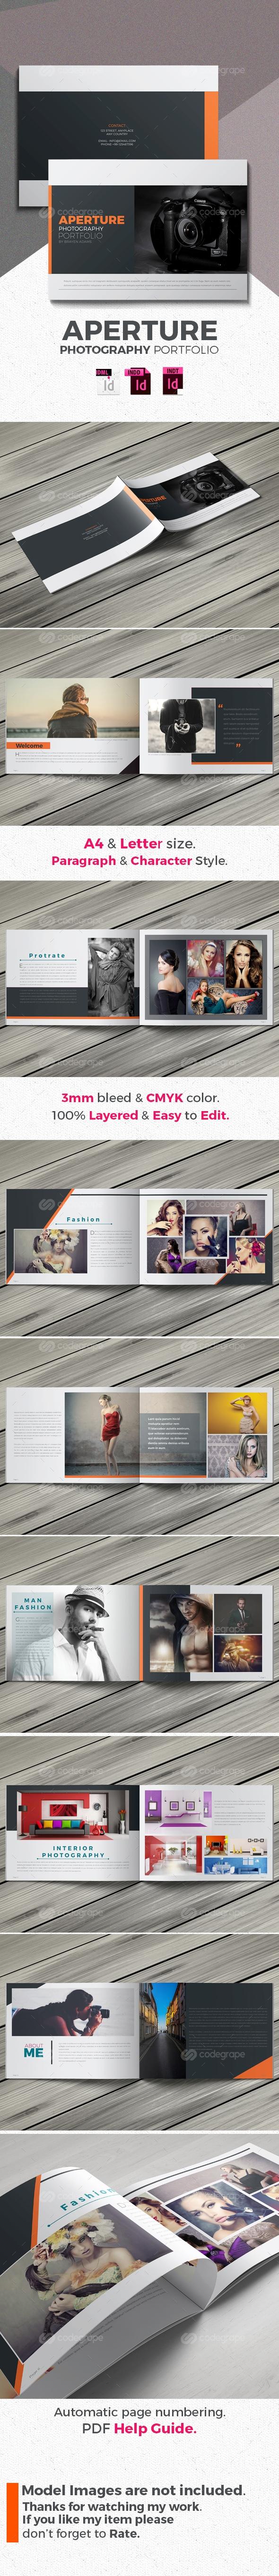 Aperture- Photography Portfolio Brochure